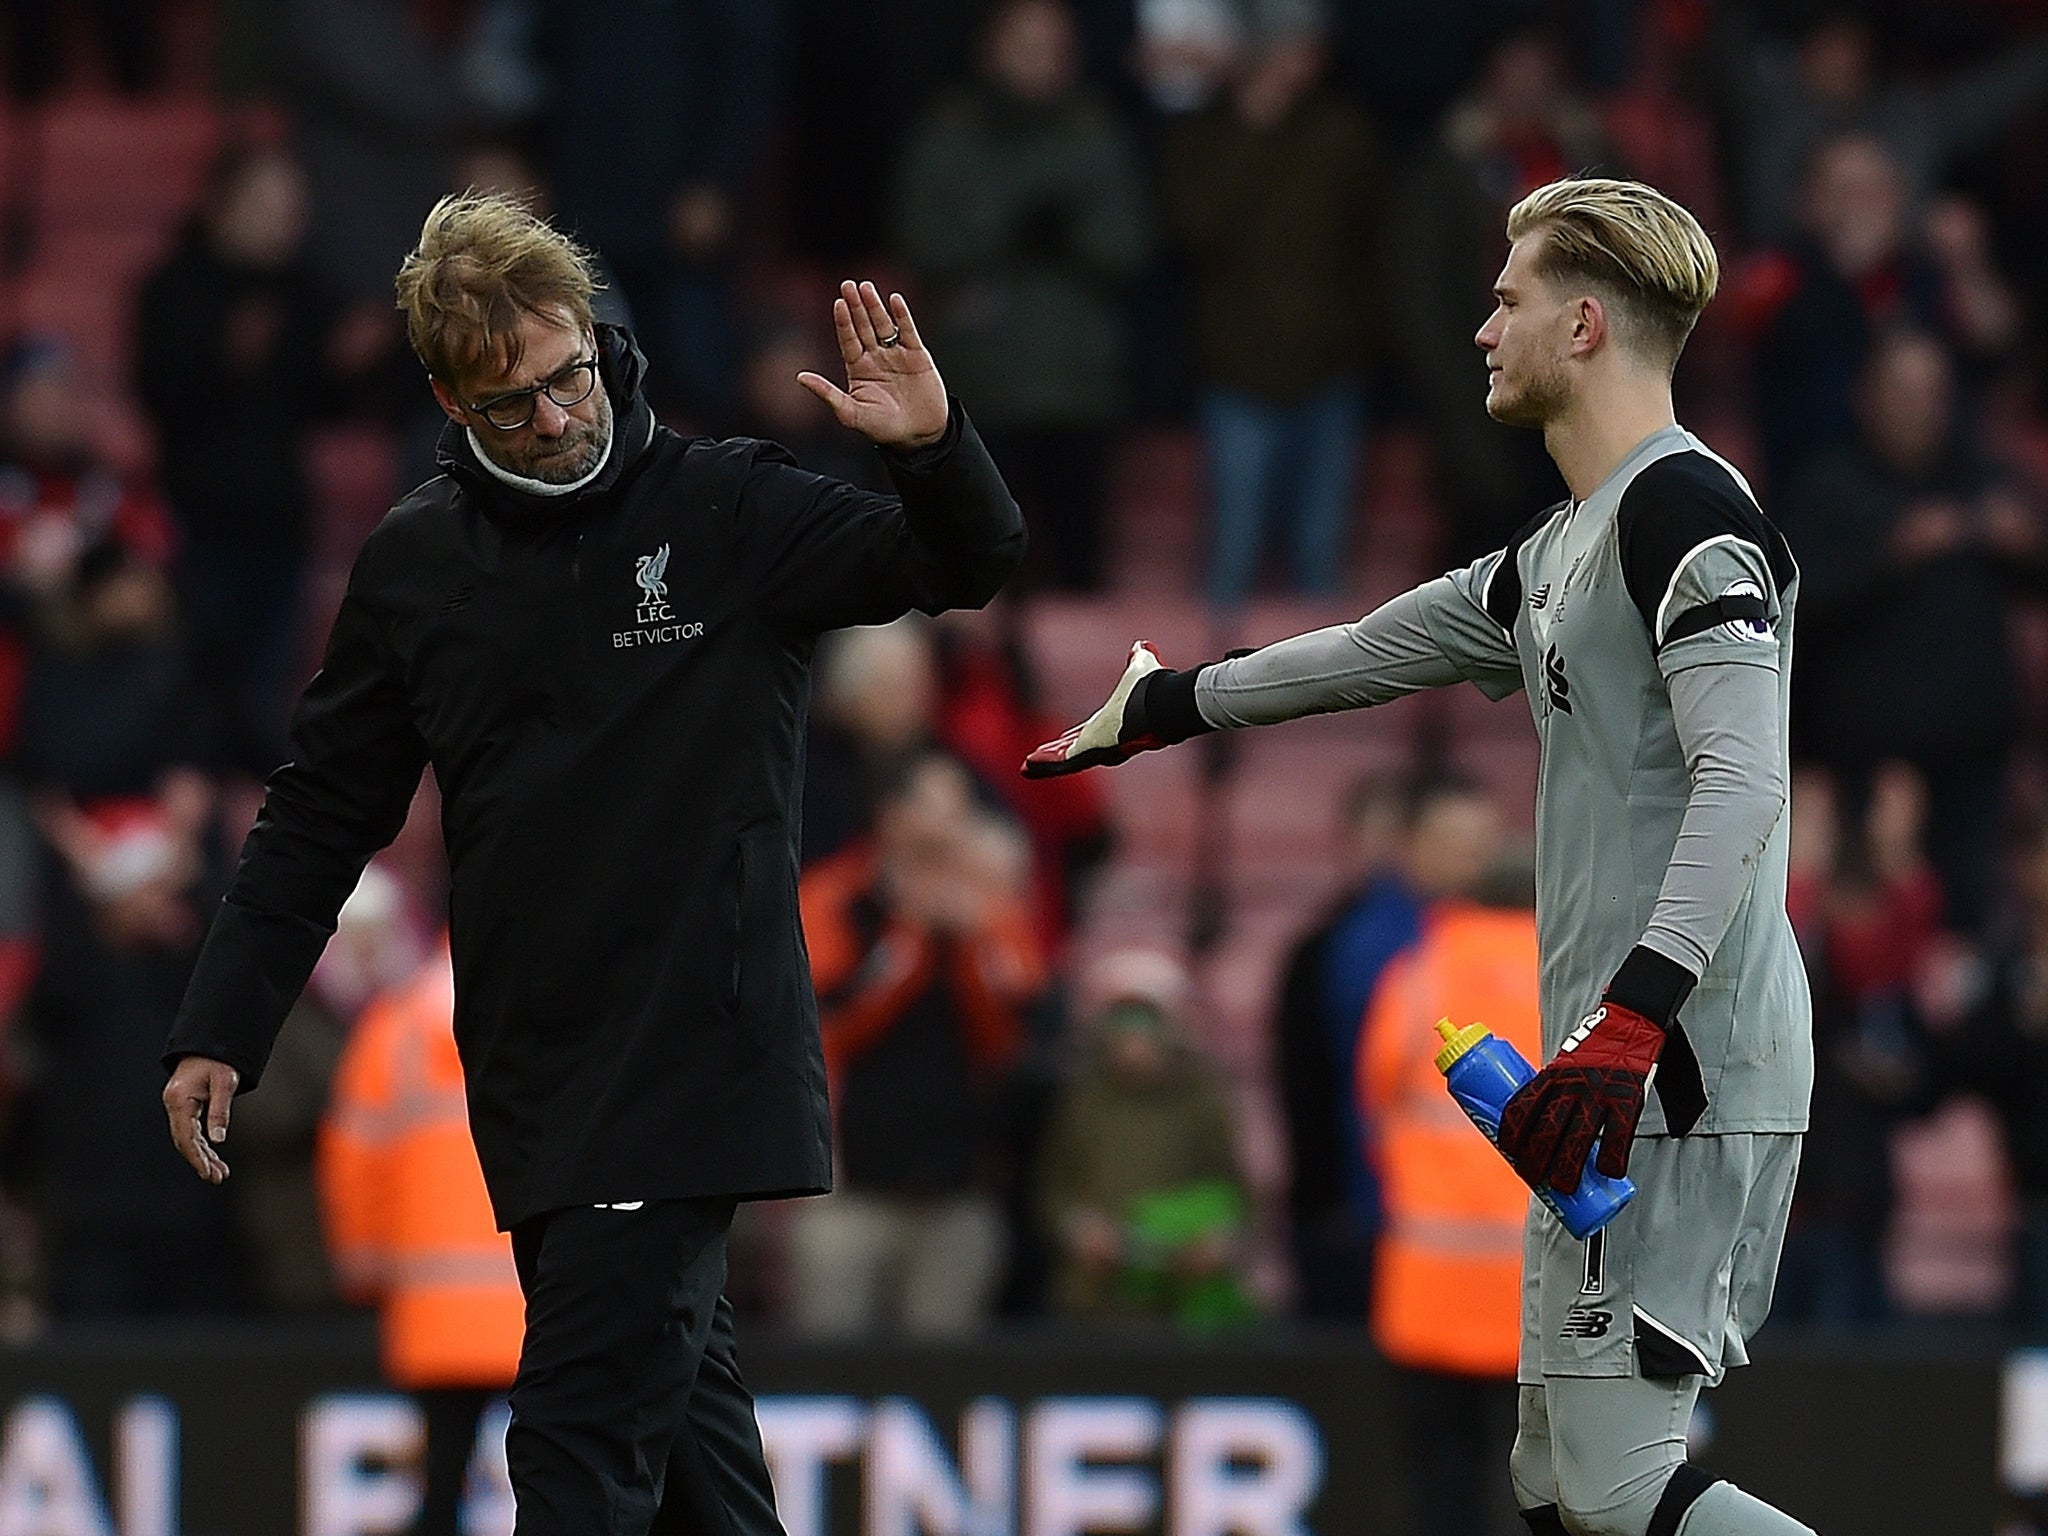 Liverpool: Jurgen Klopp Defends Loris Karius From Jamie